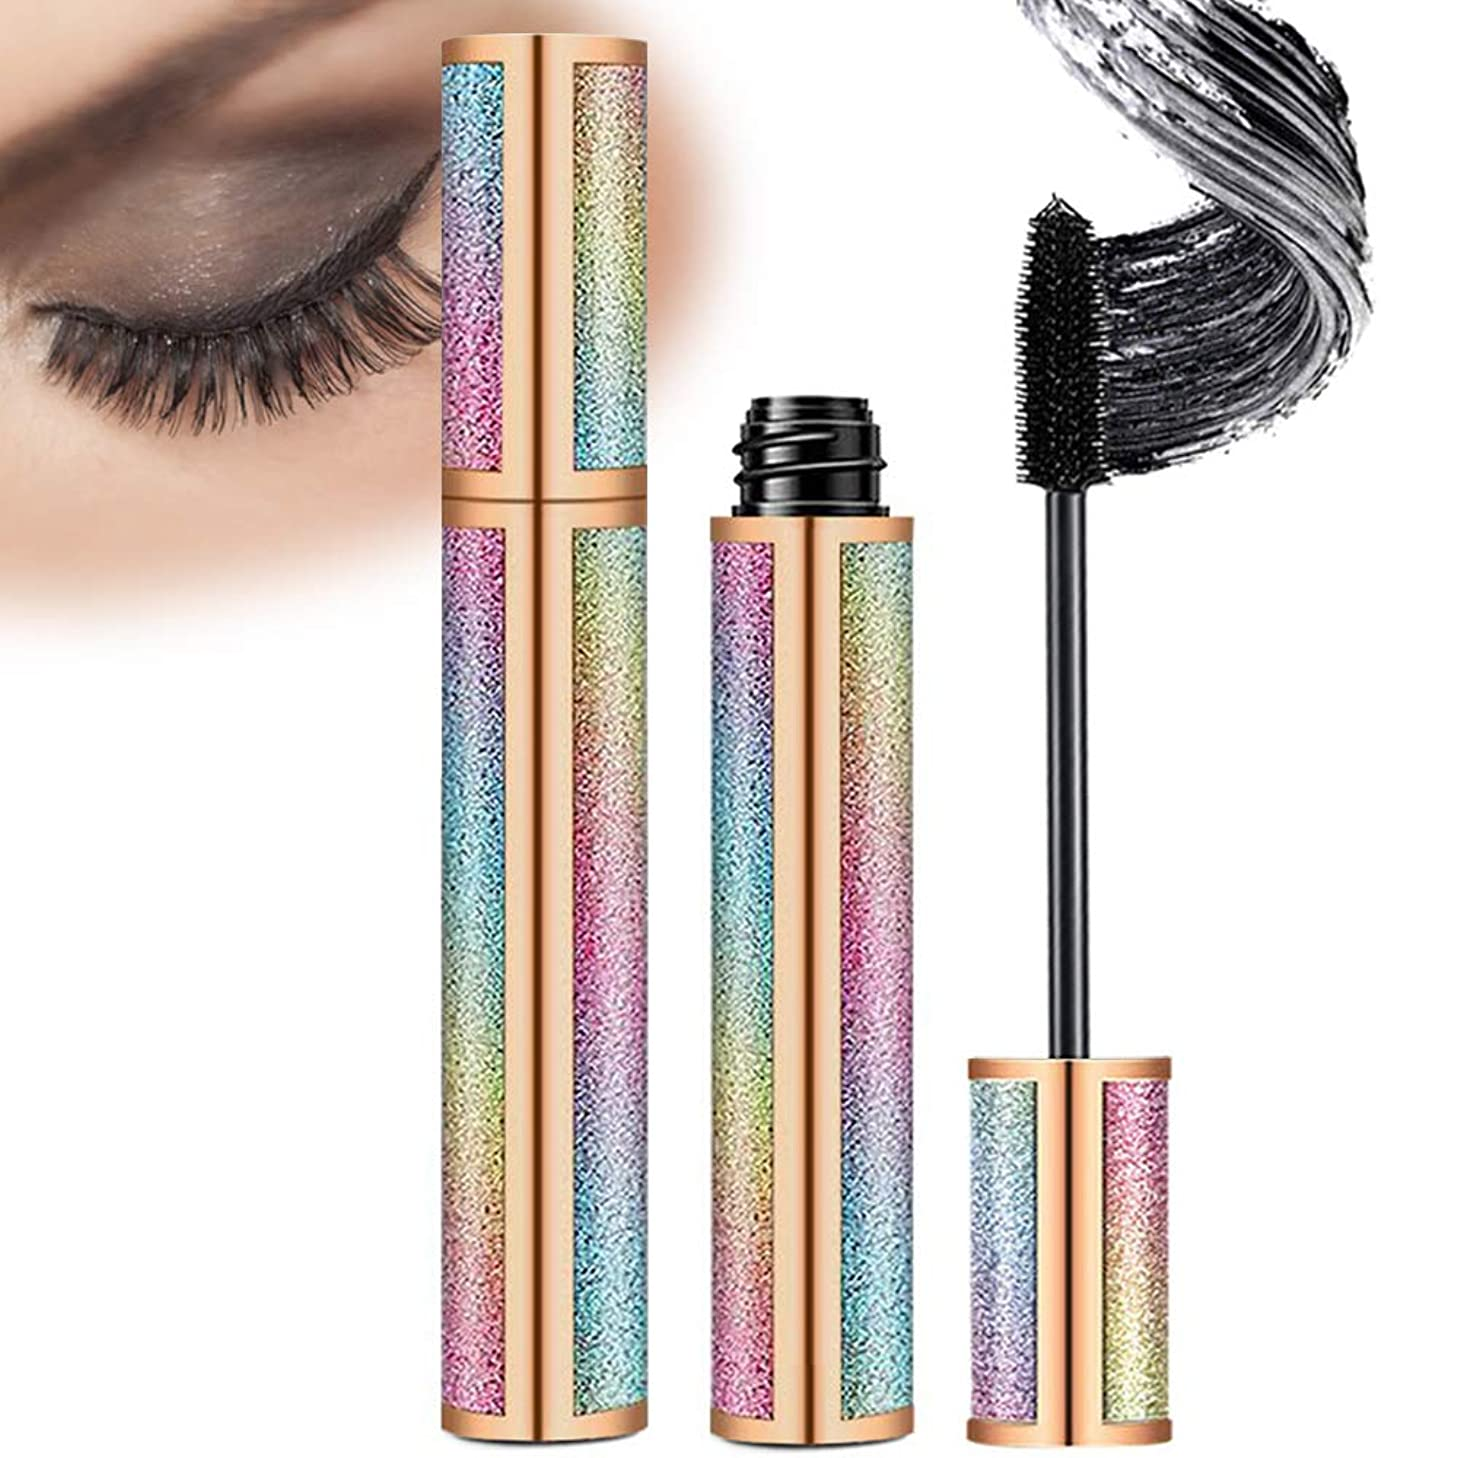 4D Silk Fiber Lash Mascara Natural Waterproof Lengthen Long Lasting?Lashes Mascara